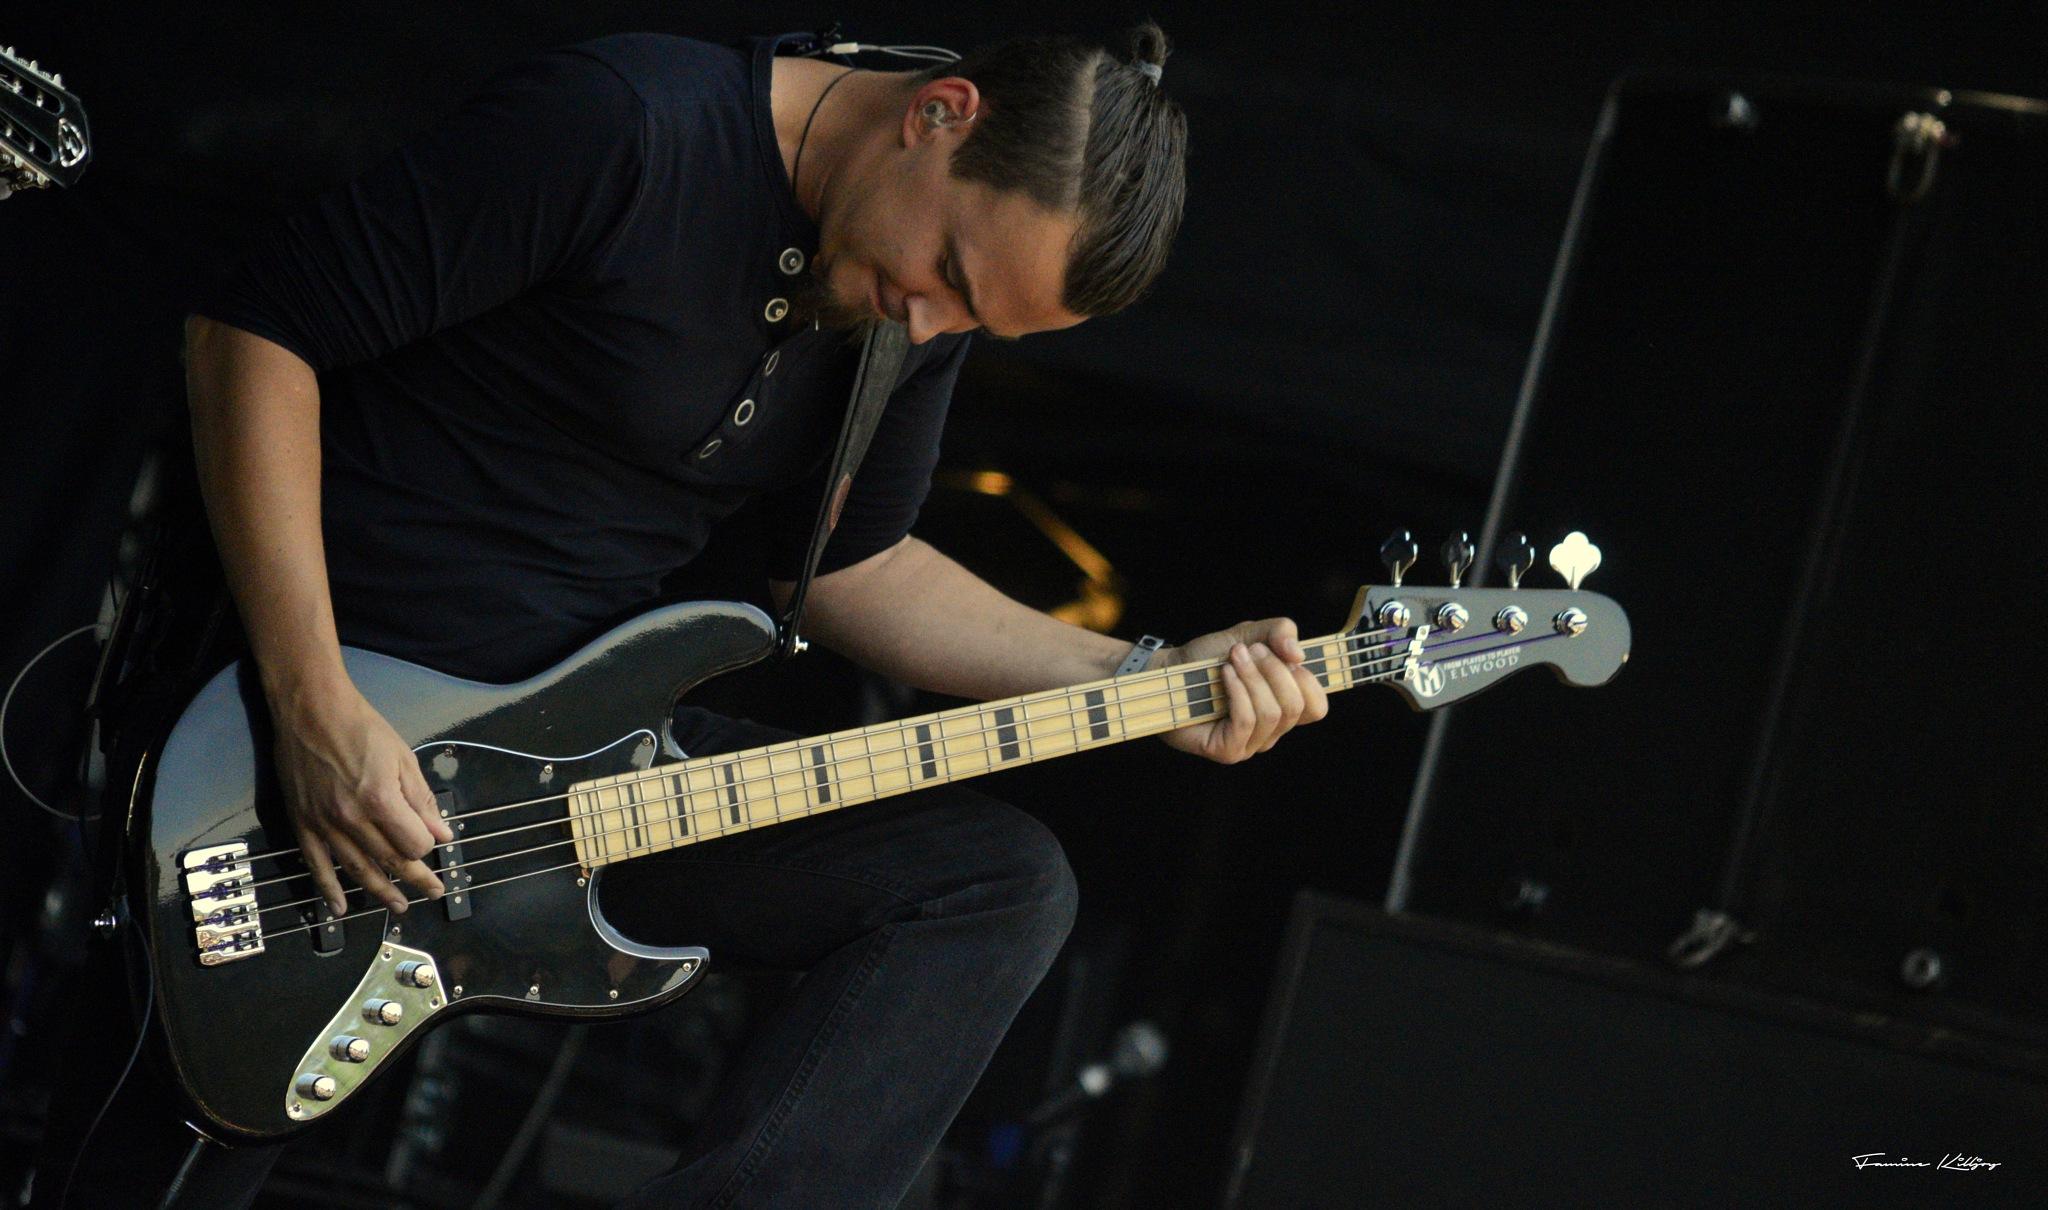 3 State Corner live @ Masters of Rock 2015 by FamineKilljoyphotographer